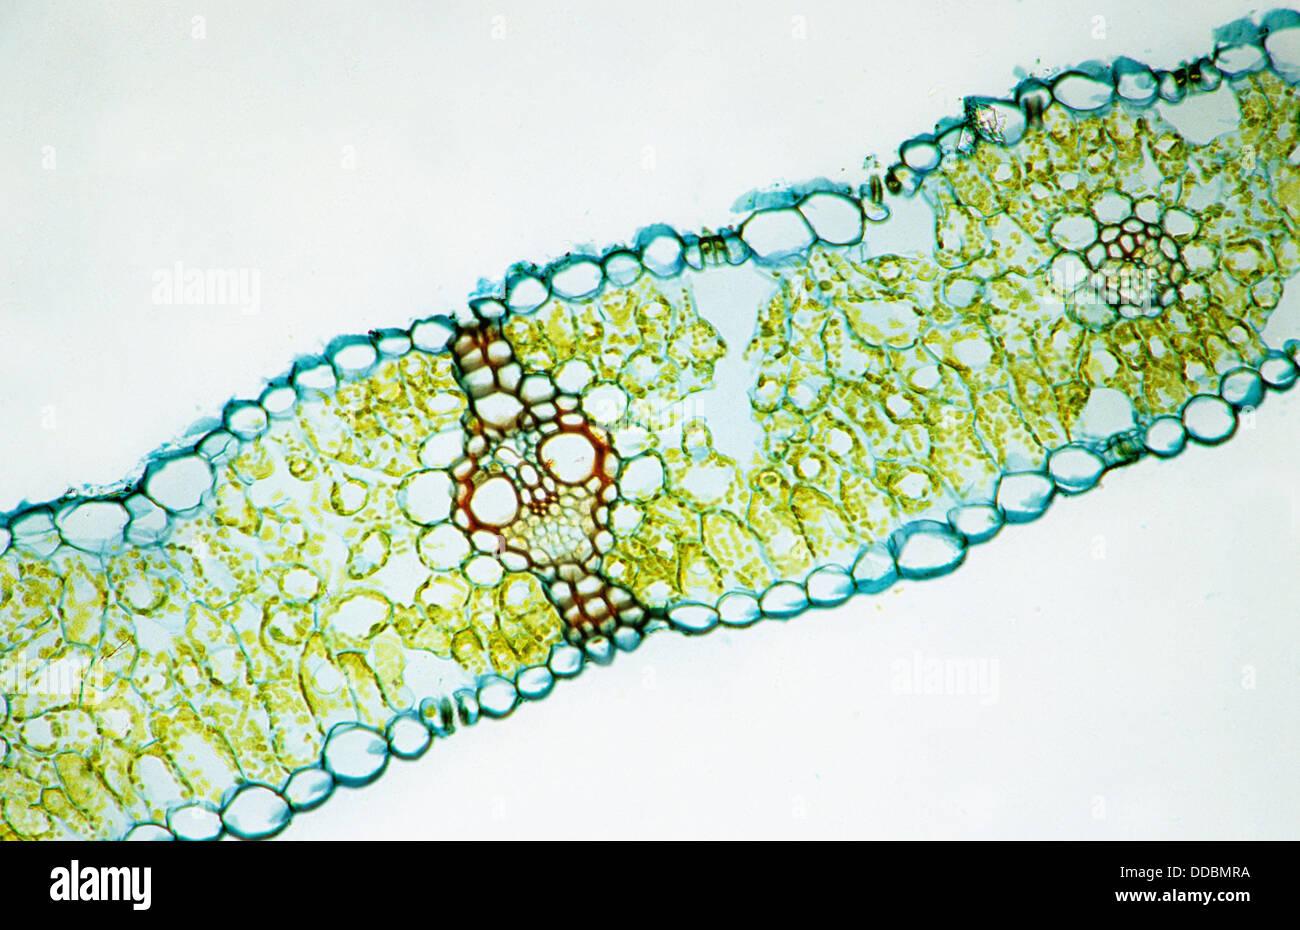 Triticum Leaf Cross Section Monocotyledon Lateral Vein